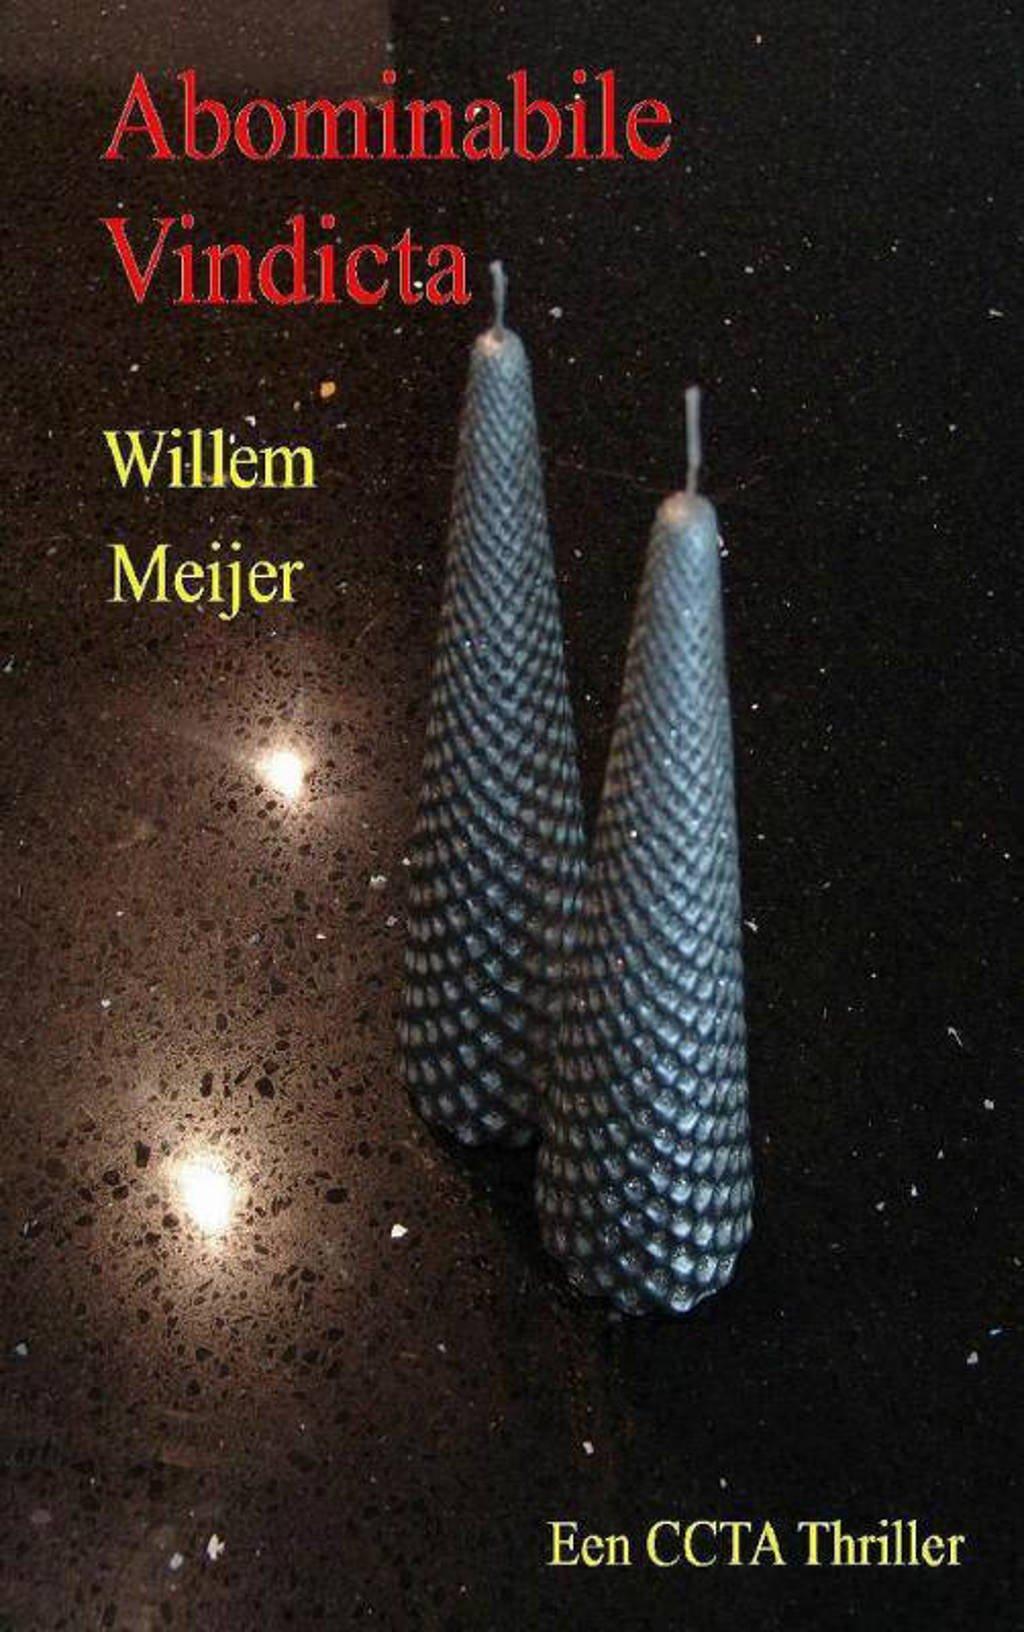 Abominabile Vindicta - Willem Meijer